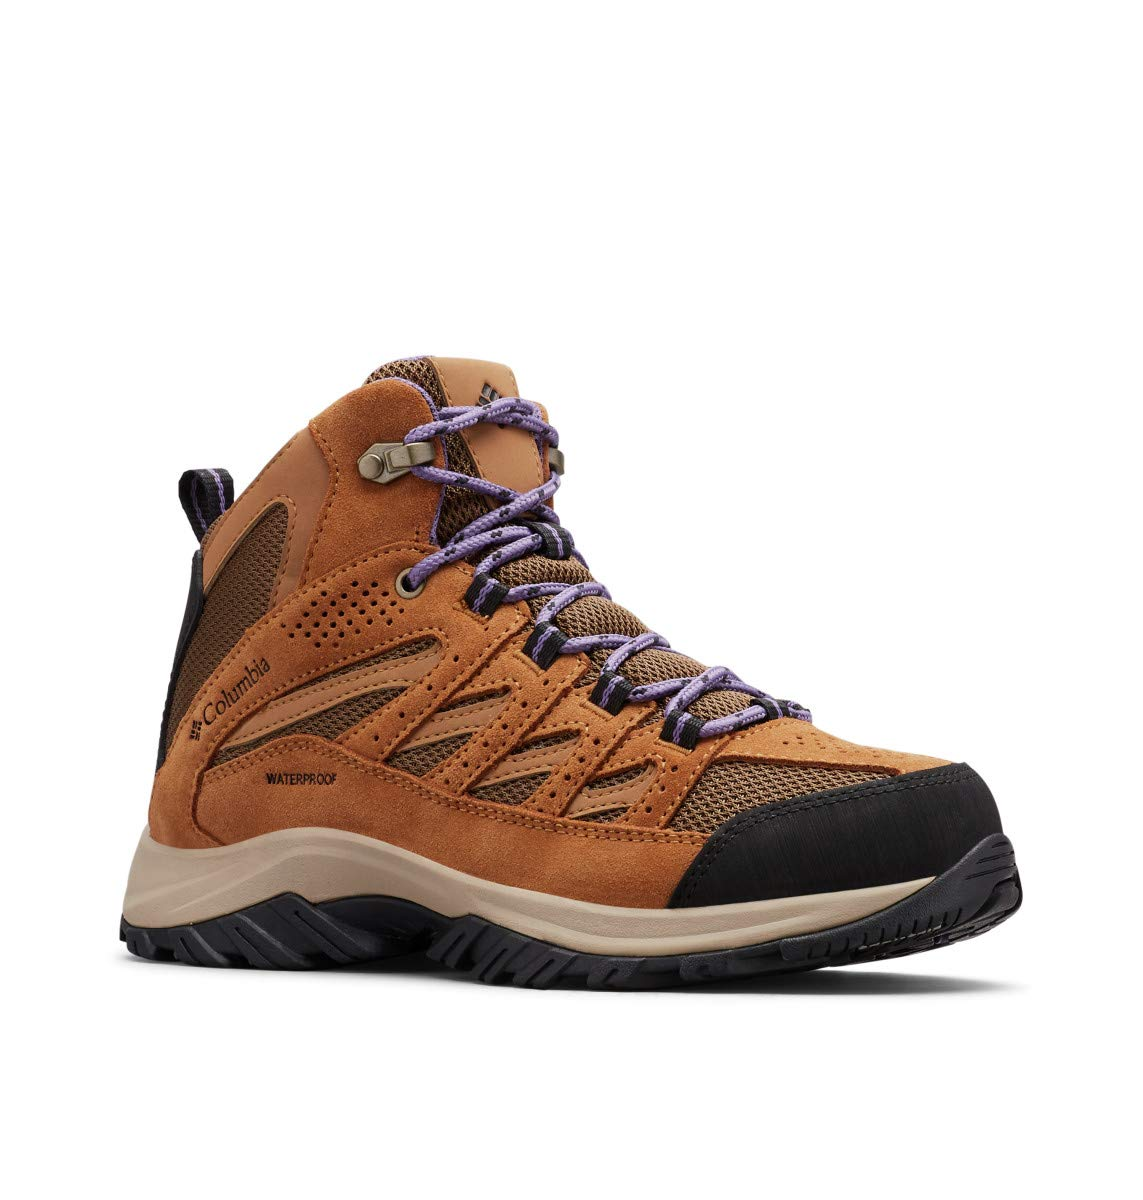 Columbia Women's Crestwood MID Waterproof Hiking Shoe, Dark Truffle, Plum Purple, 11 Regular US by Columbia